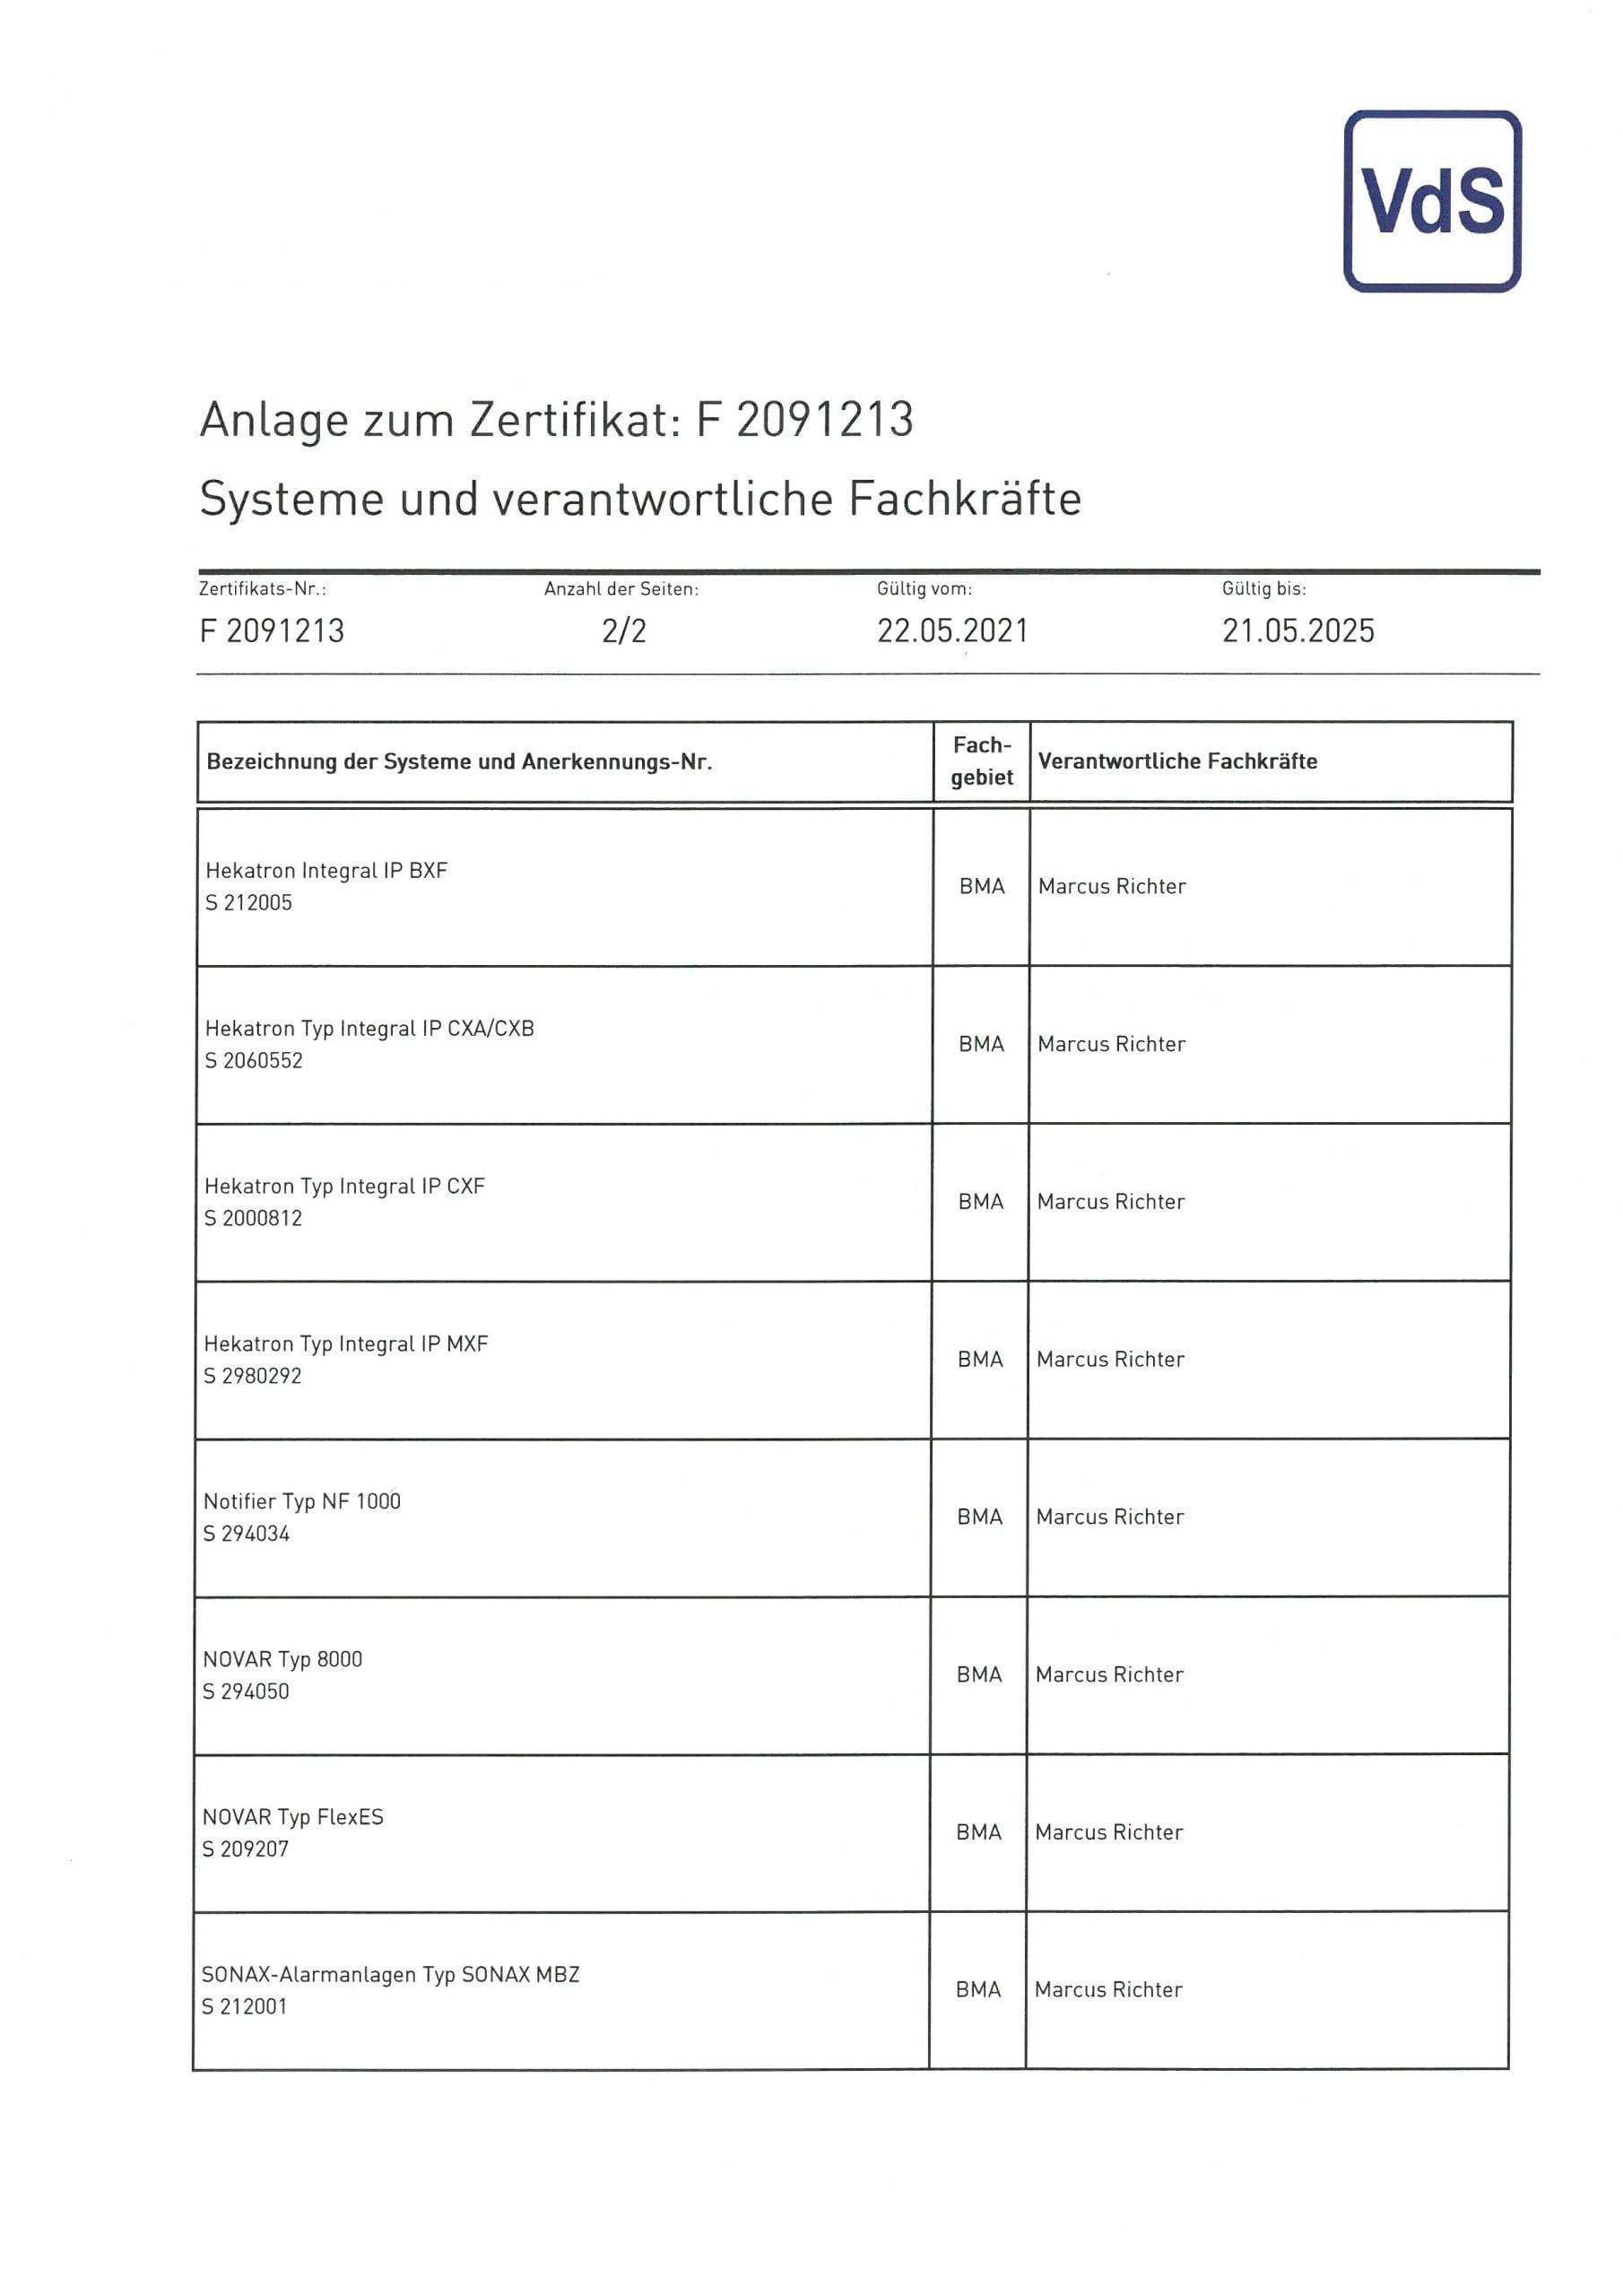 Anlage Zertifikat F 2091213